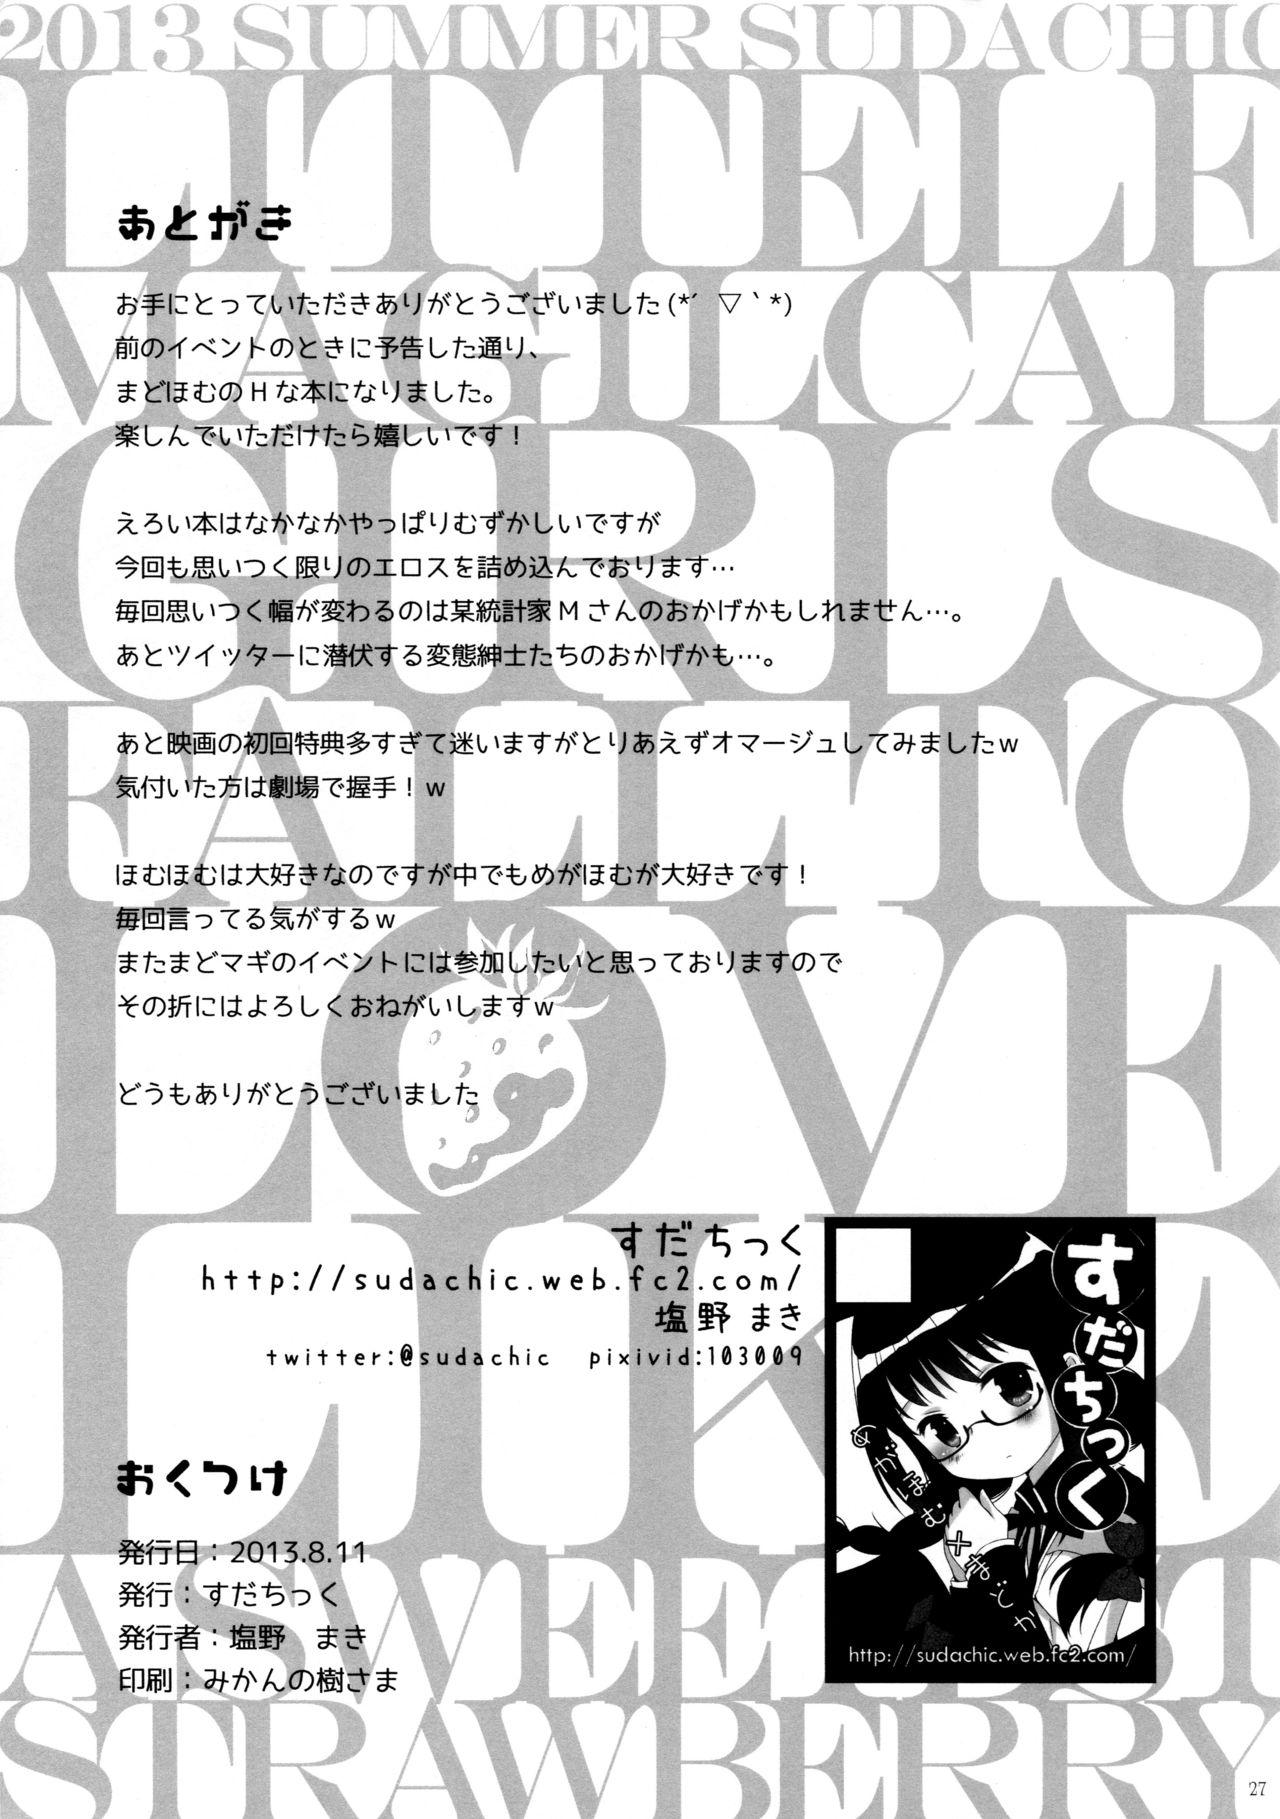 Otome Koichigo - a sweetest strawberry 27